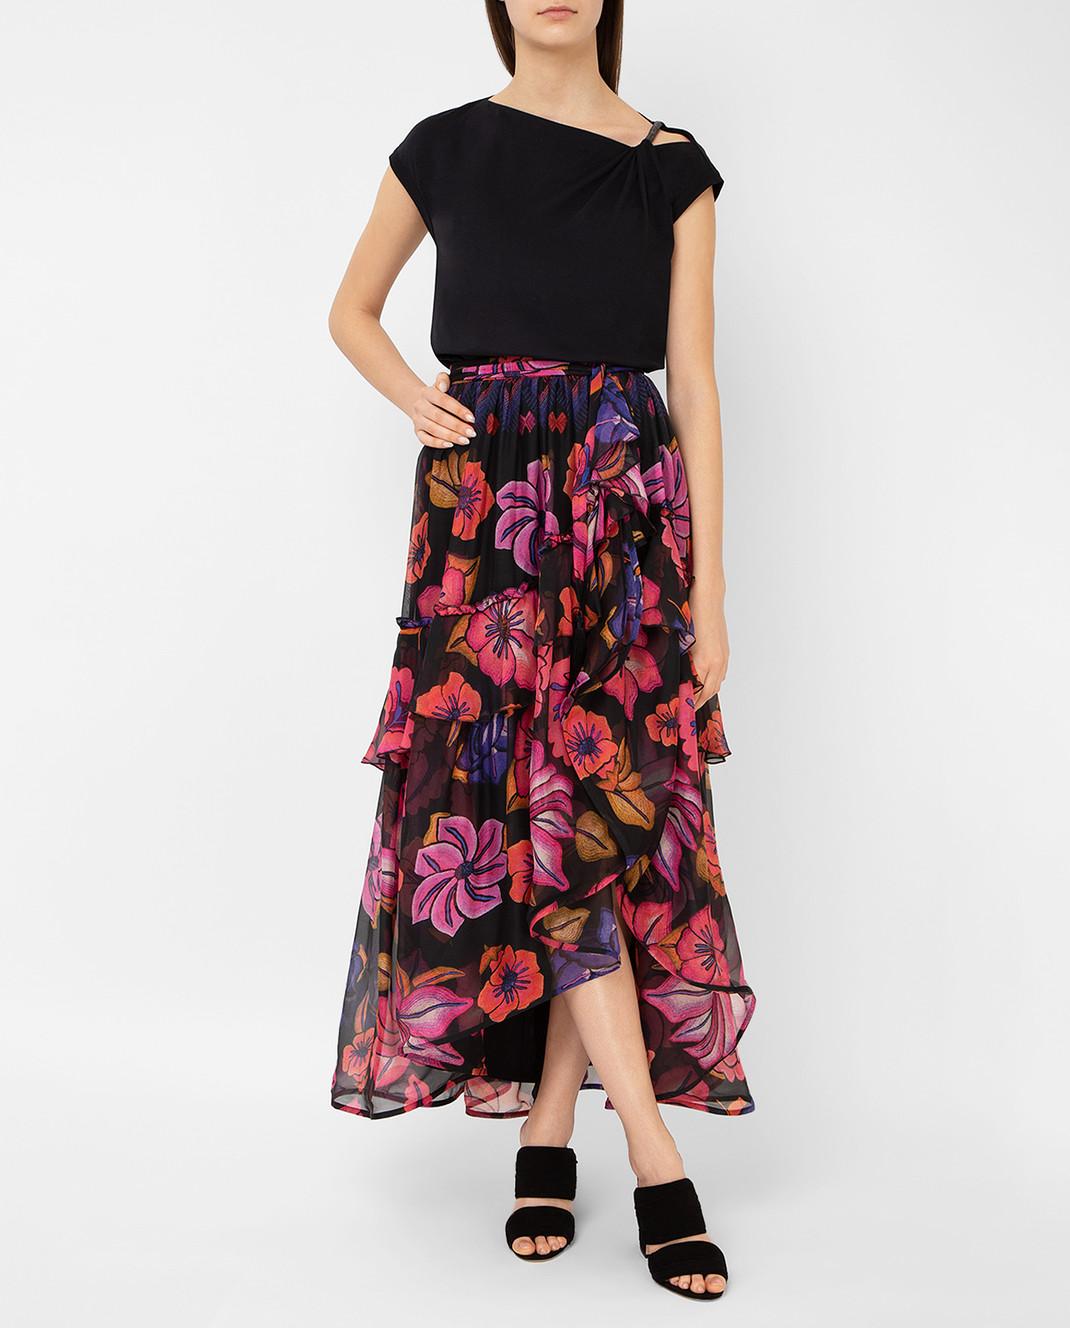 Alberta Ferretti Черная юбка из шелка A0122 изображение 2